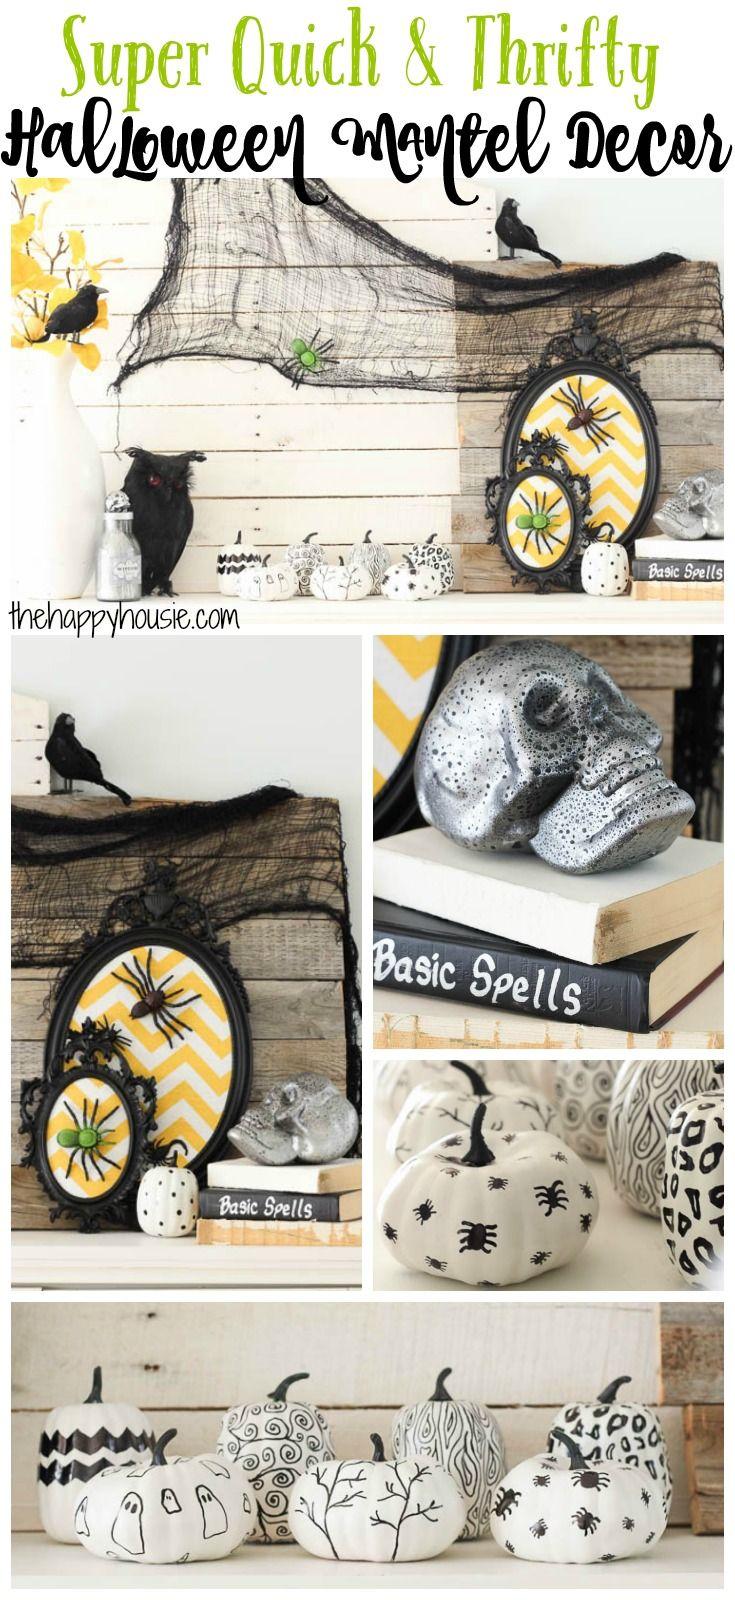 Super Quick and Thrifty Halloween Mantel Decor | Pinterest | Home ...